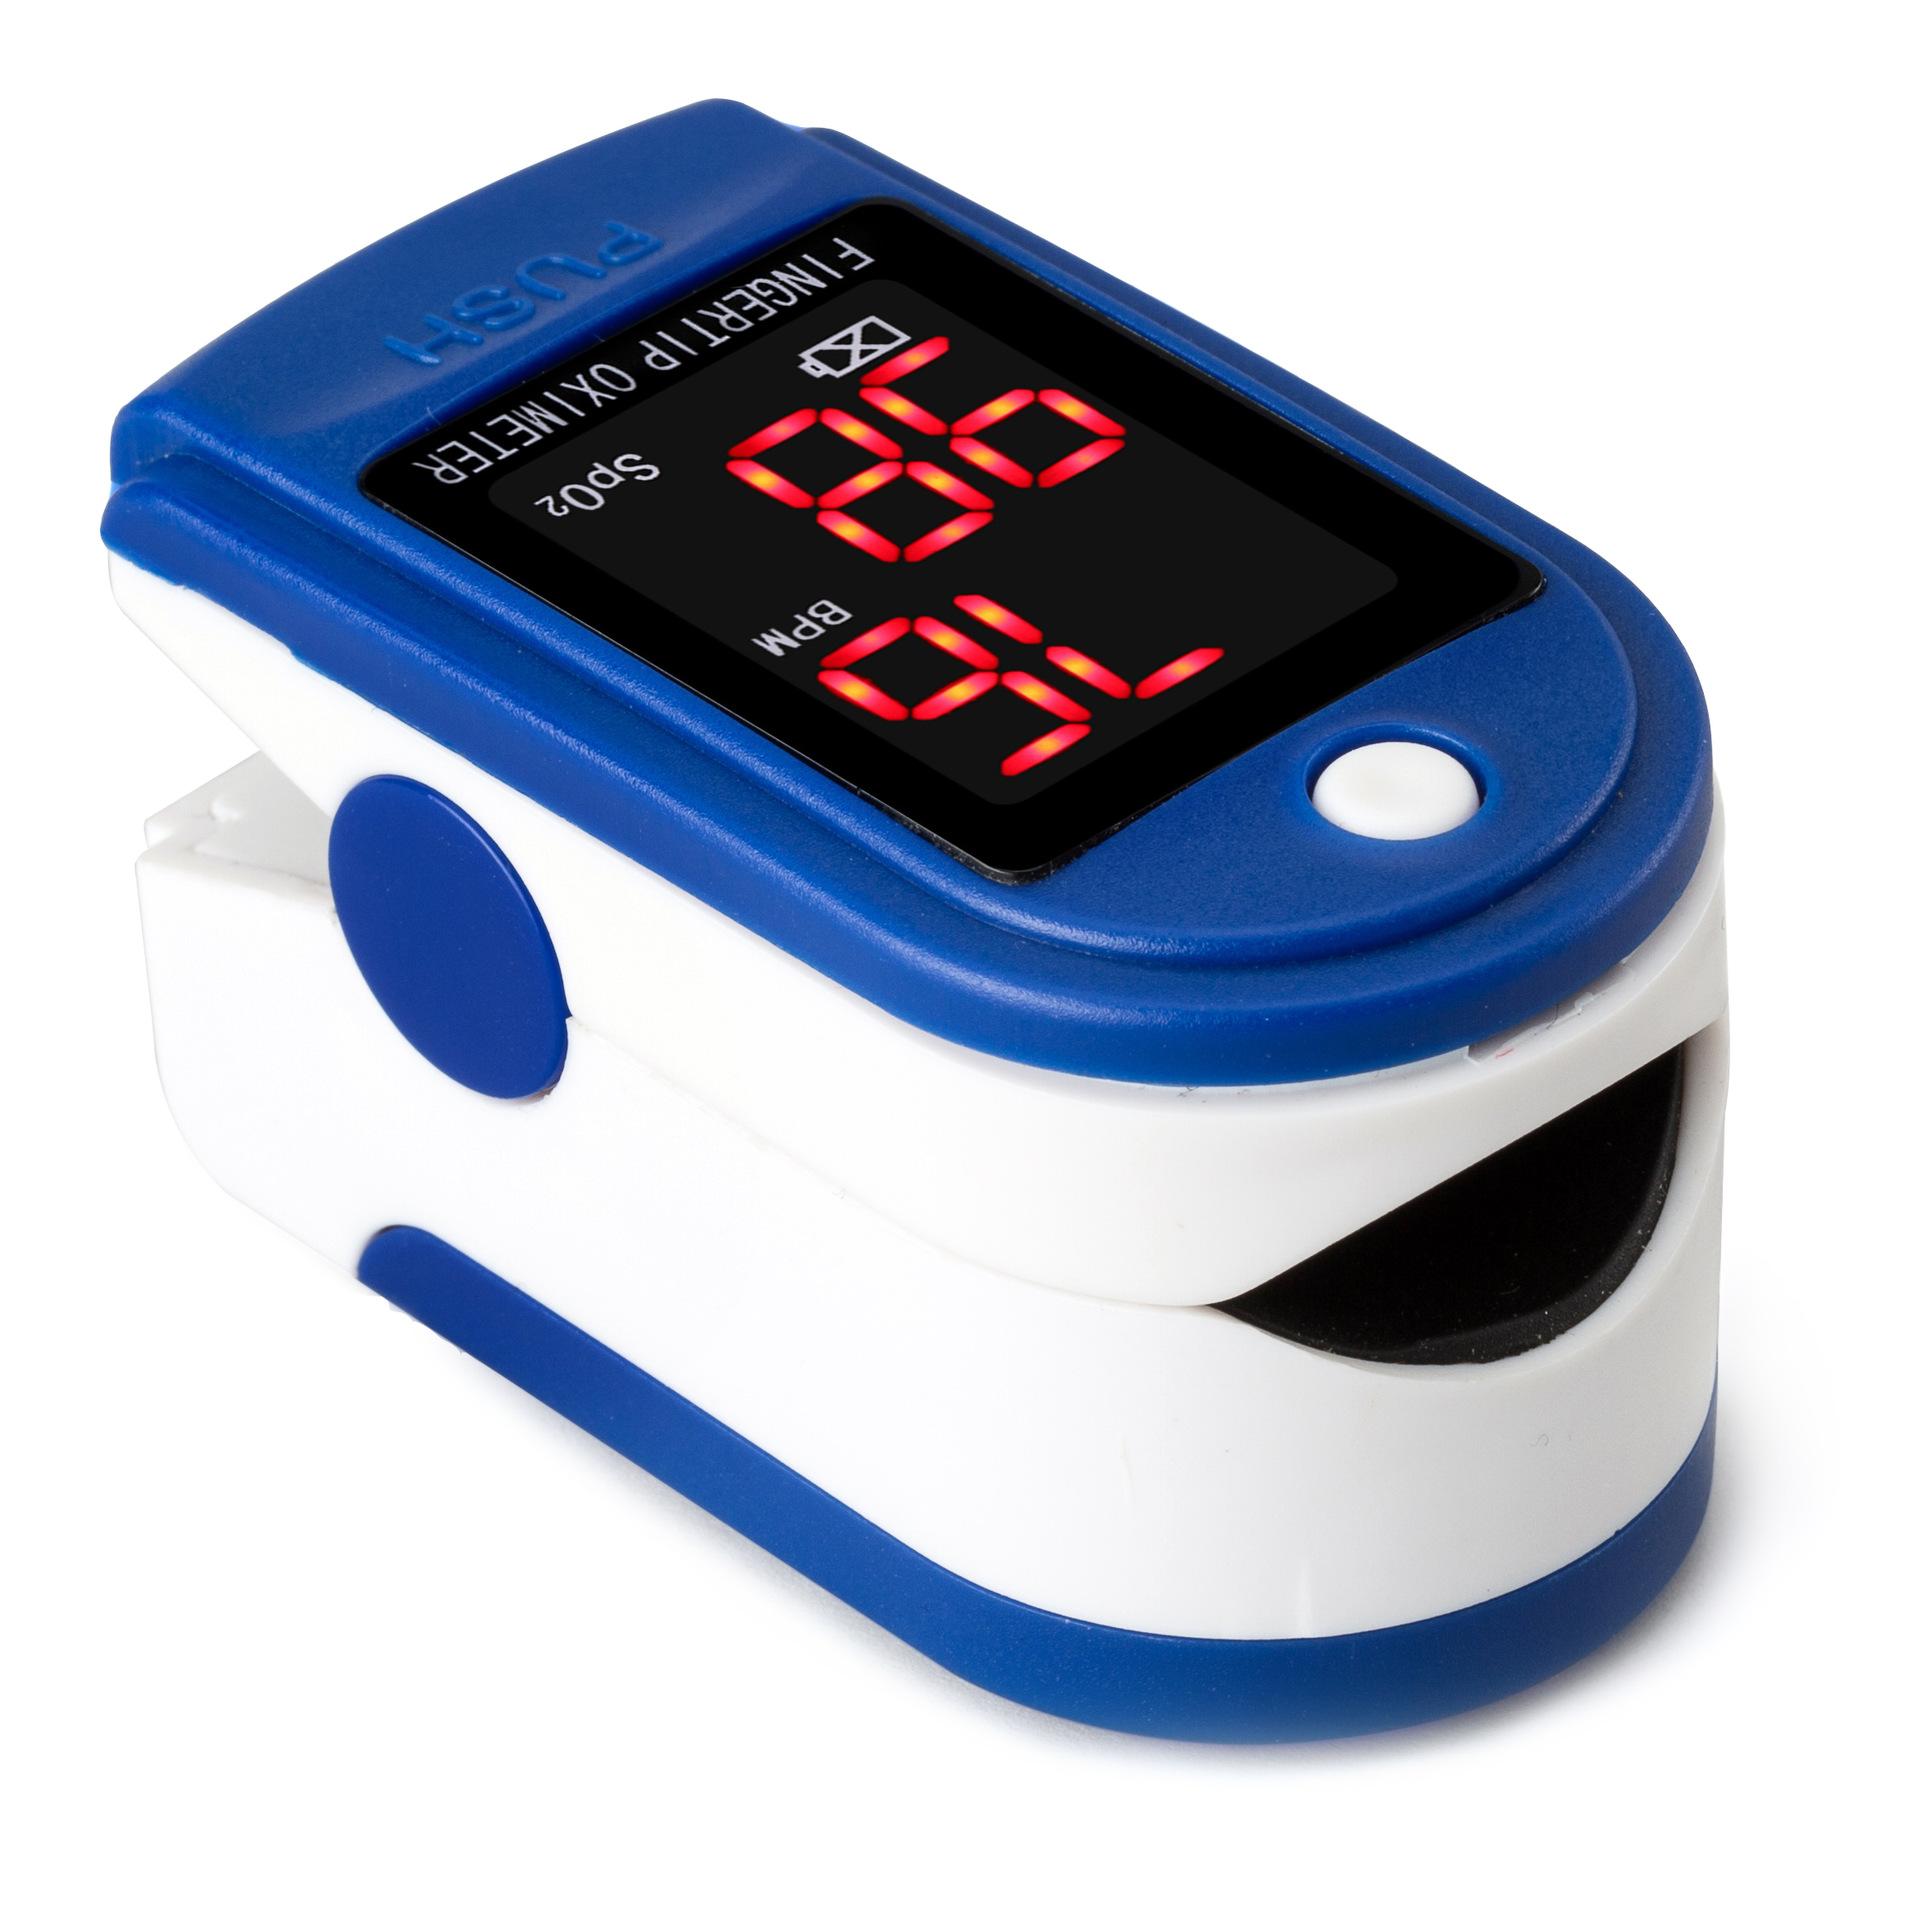 JZIKI手指夹式脉搏血氧仪 厂家直销电子血氧仪外贸出口爆款